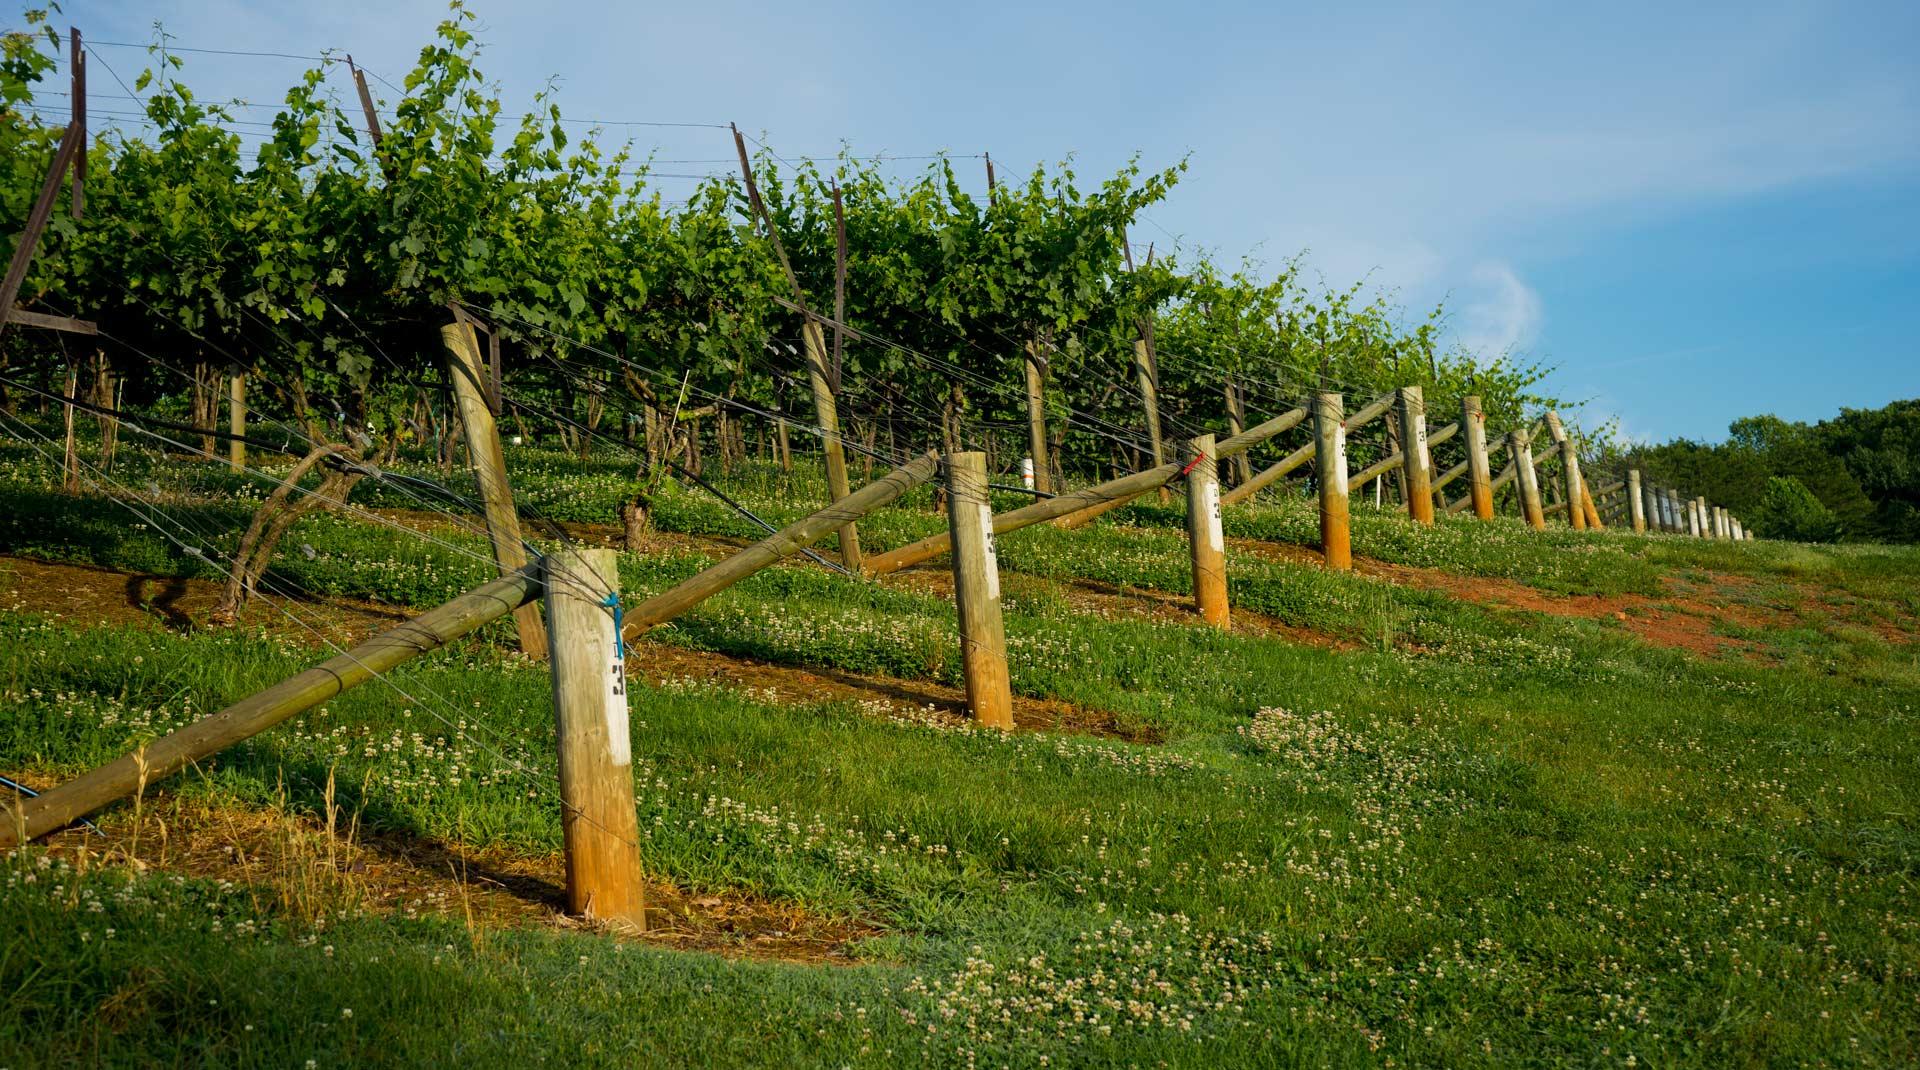 Dahlonega Winery Bed And Breakfast